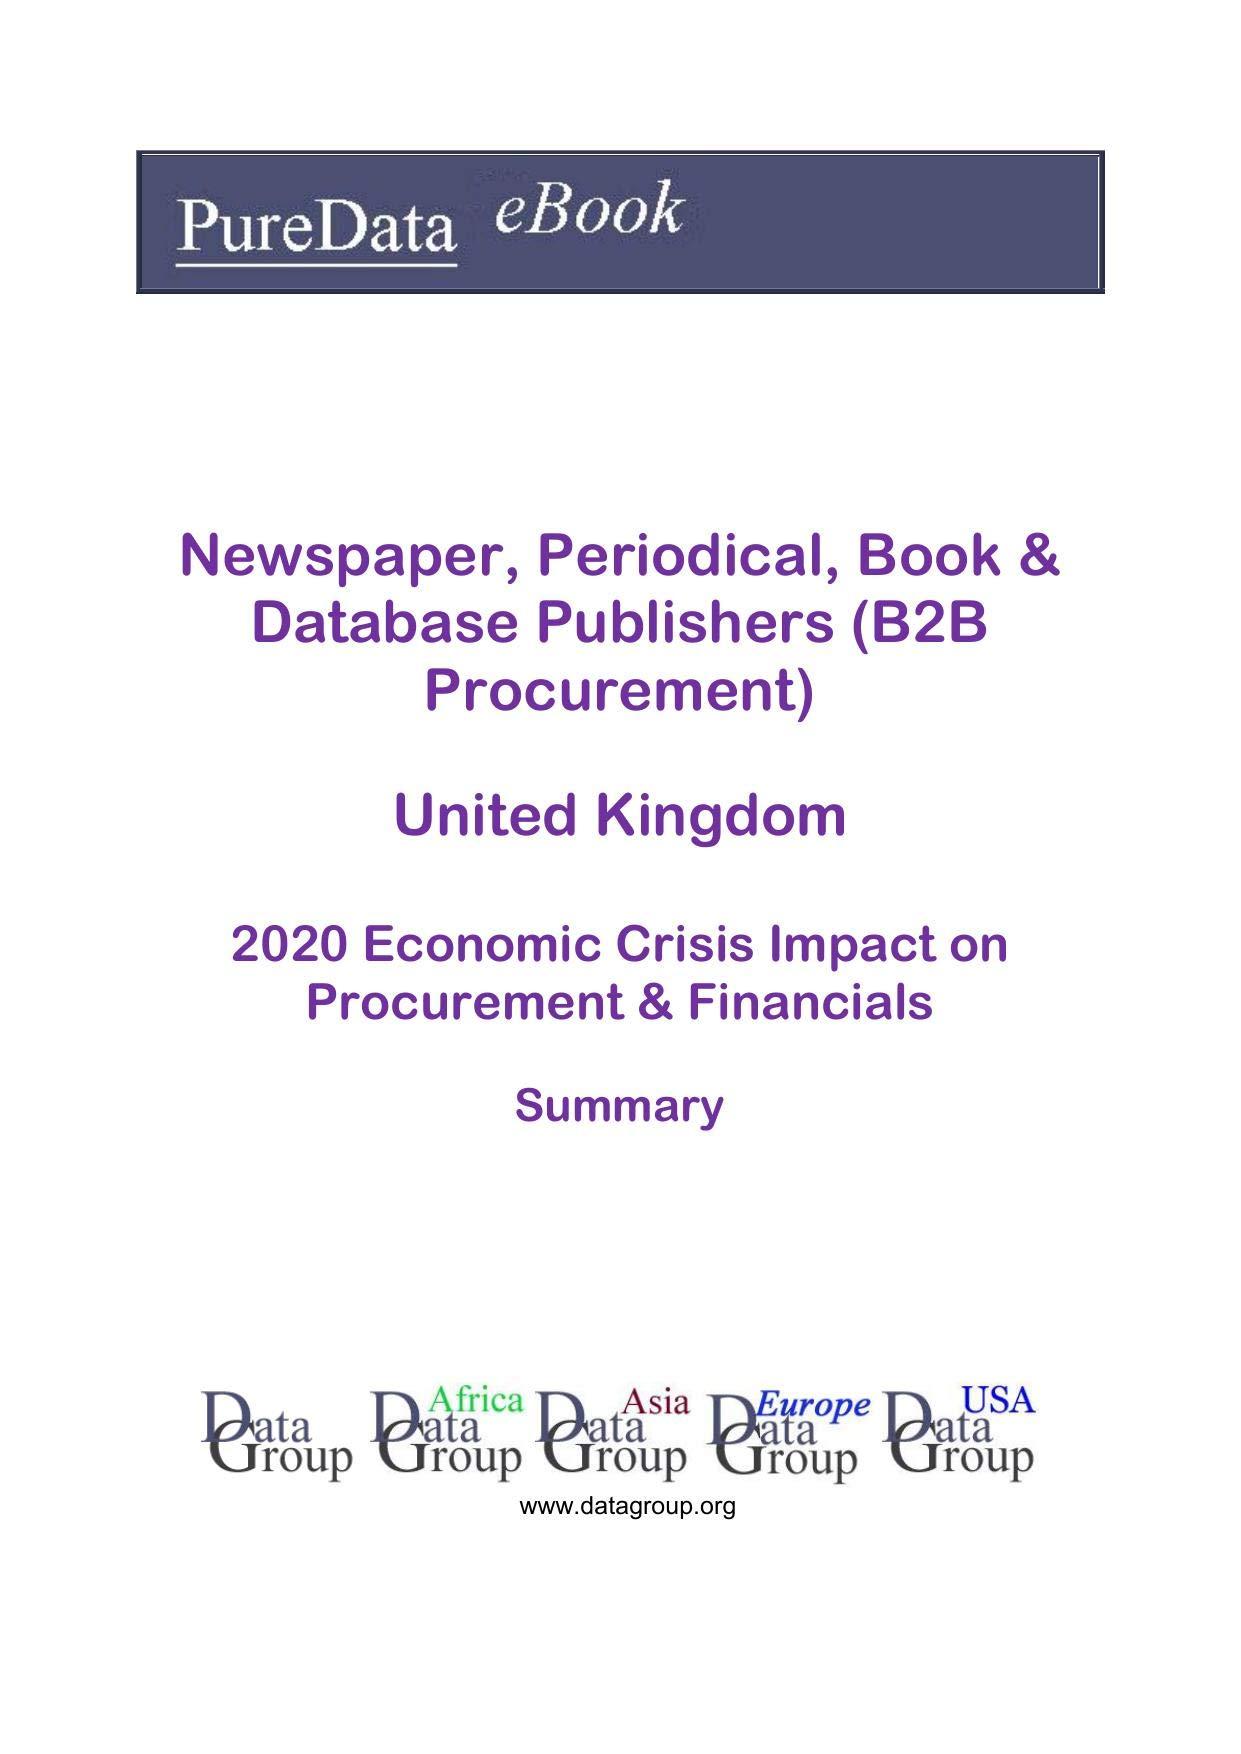 Newspaper, Periodical, Book & Database Publishers (B2B Procurement) United Kingdom Summary: 2020 Economic Crisis Impact on Revenues & Financials